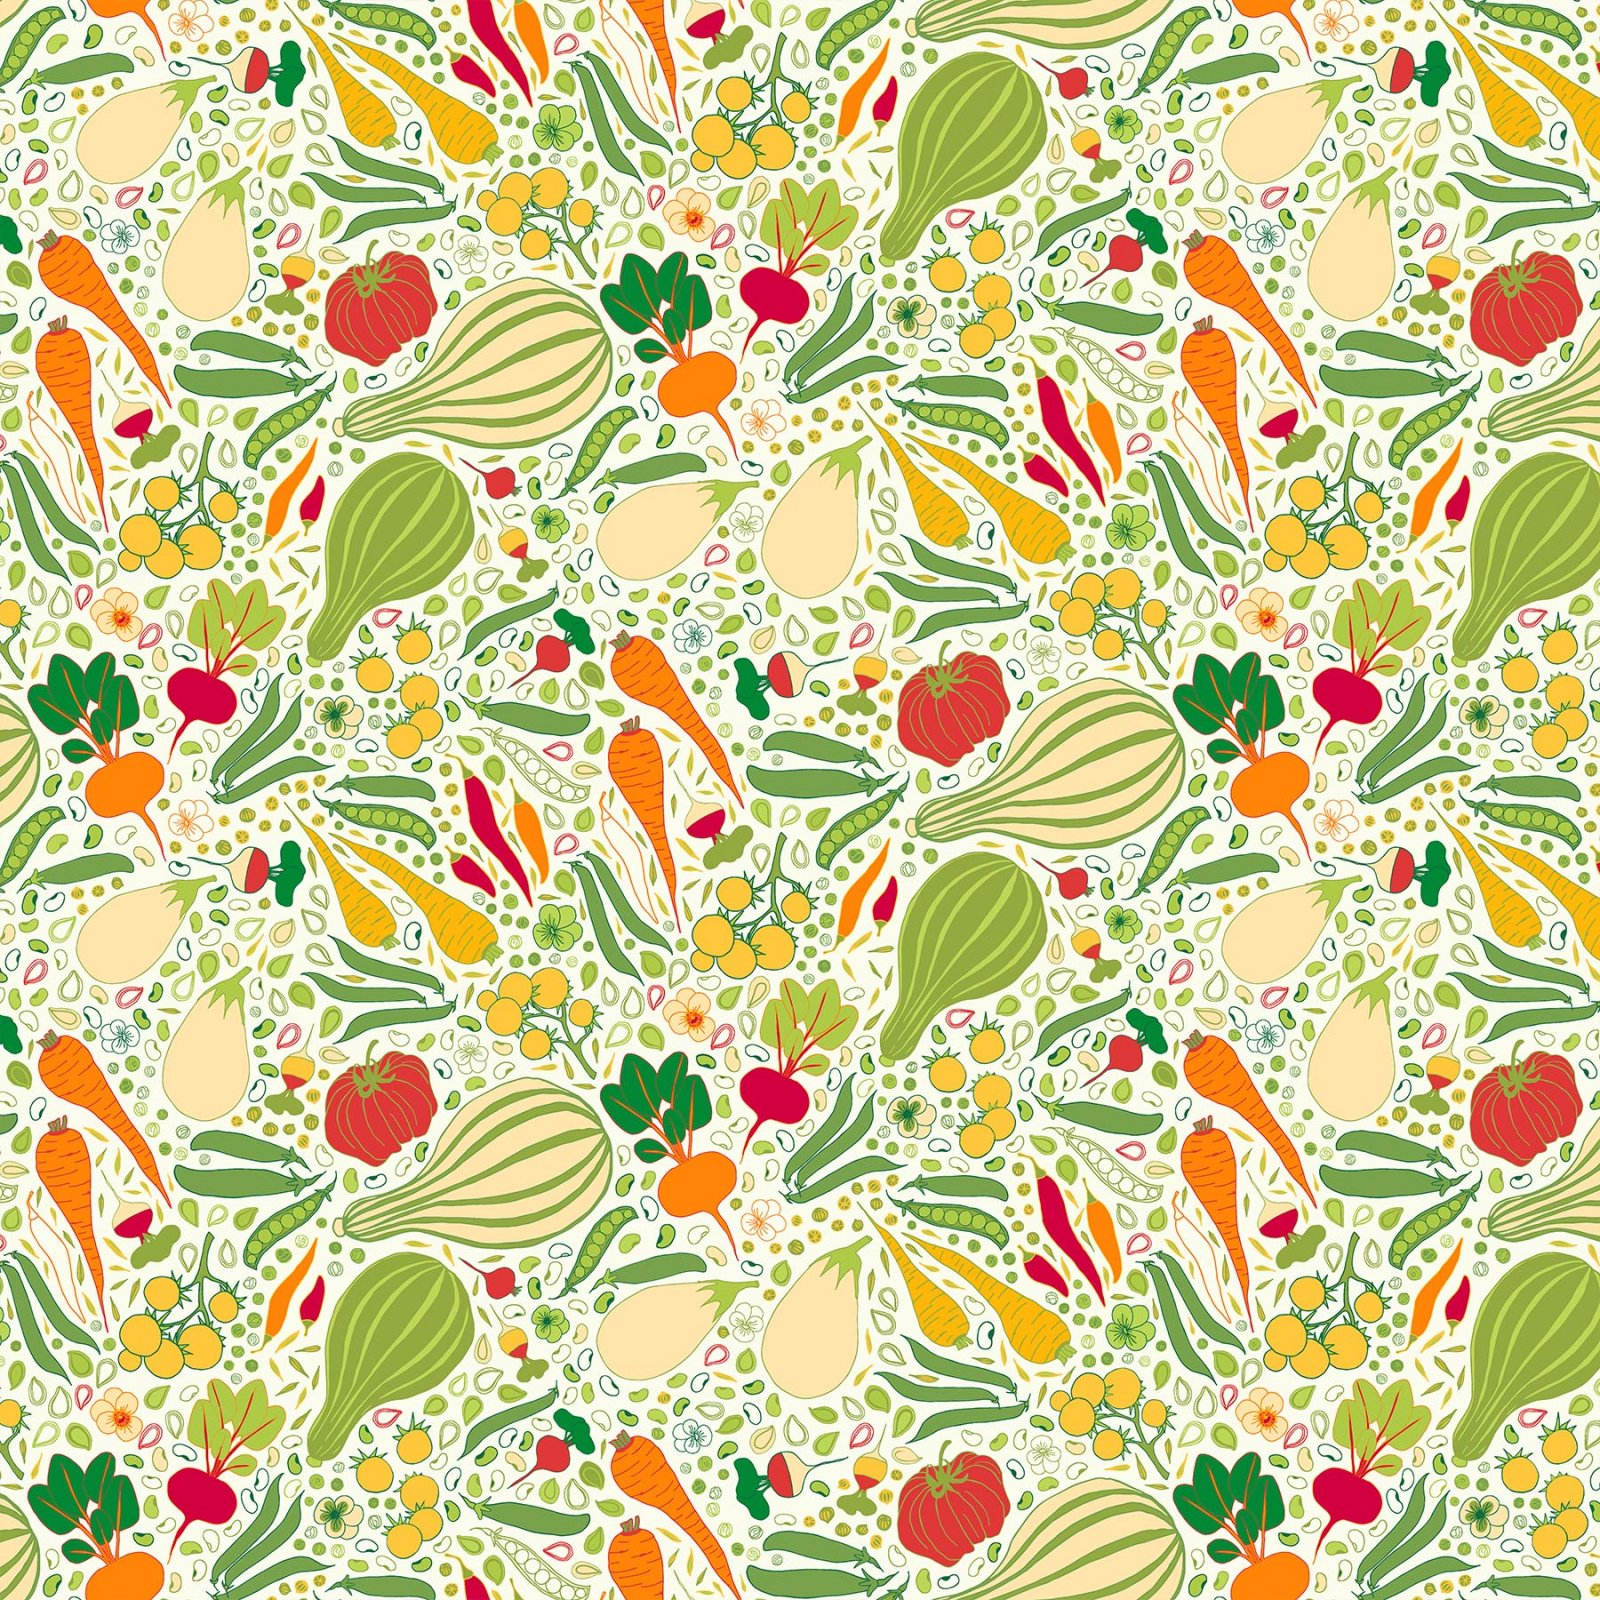 Grow by Pippa Shaw for Figo Fabrics - Vegetables - Beige Multi